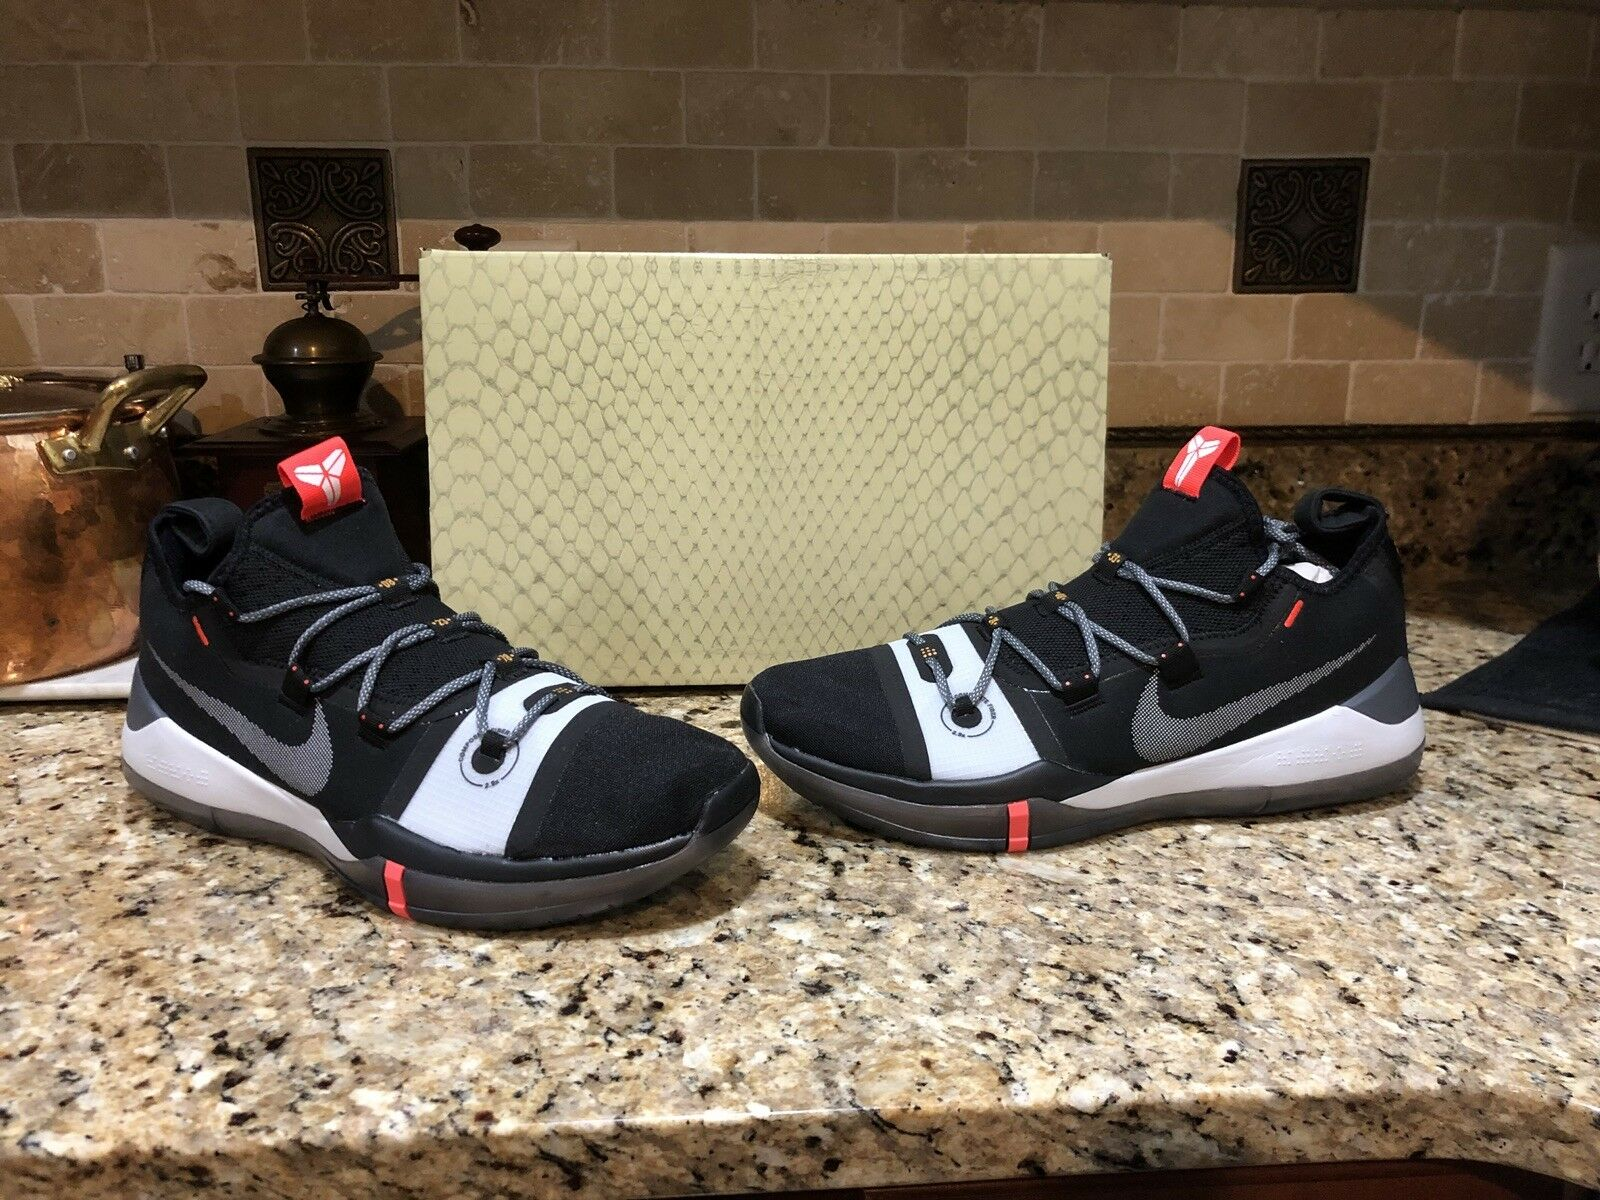 Nike Kobe AD Black Fundamentals Mamba Day Men's Basketball shoes 13